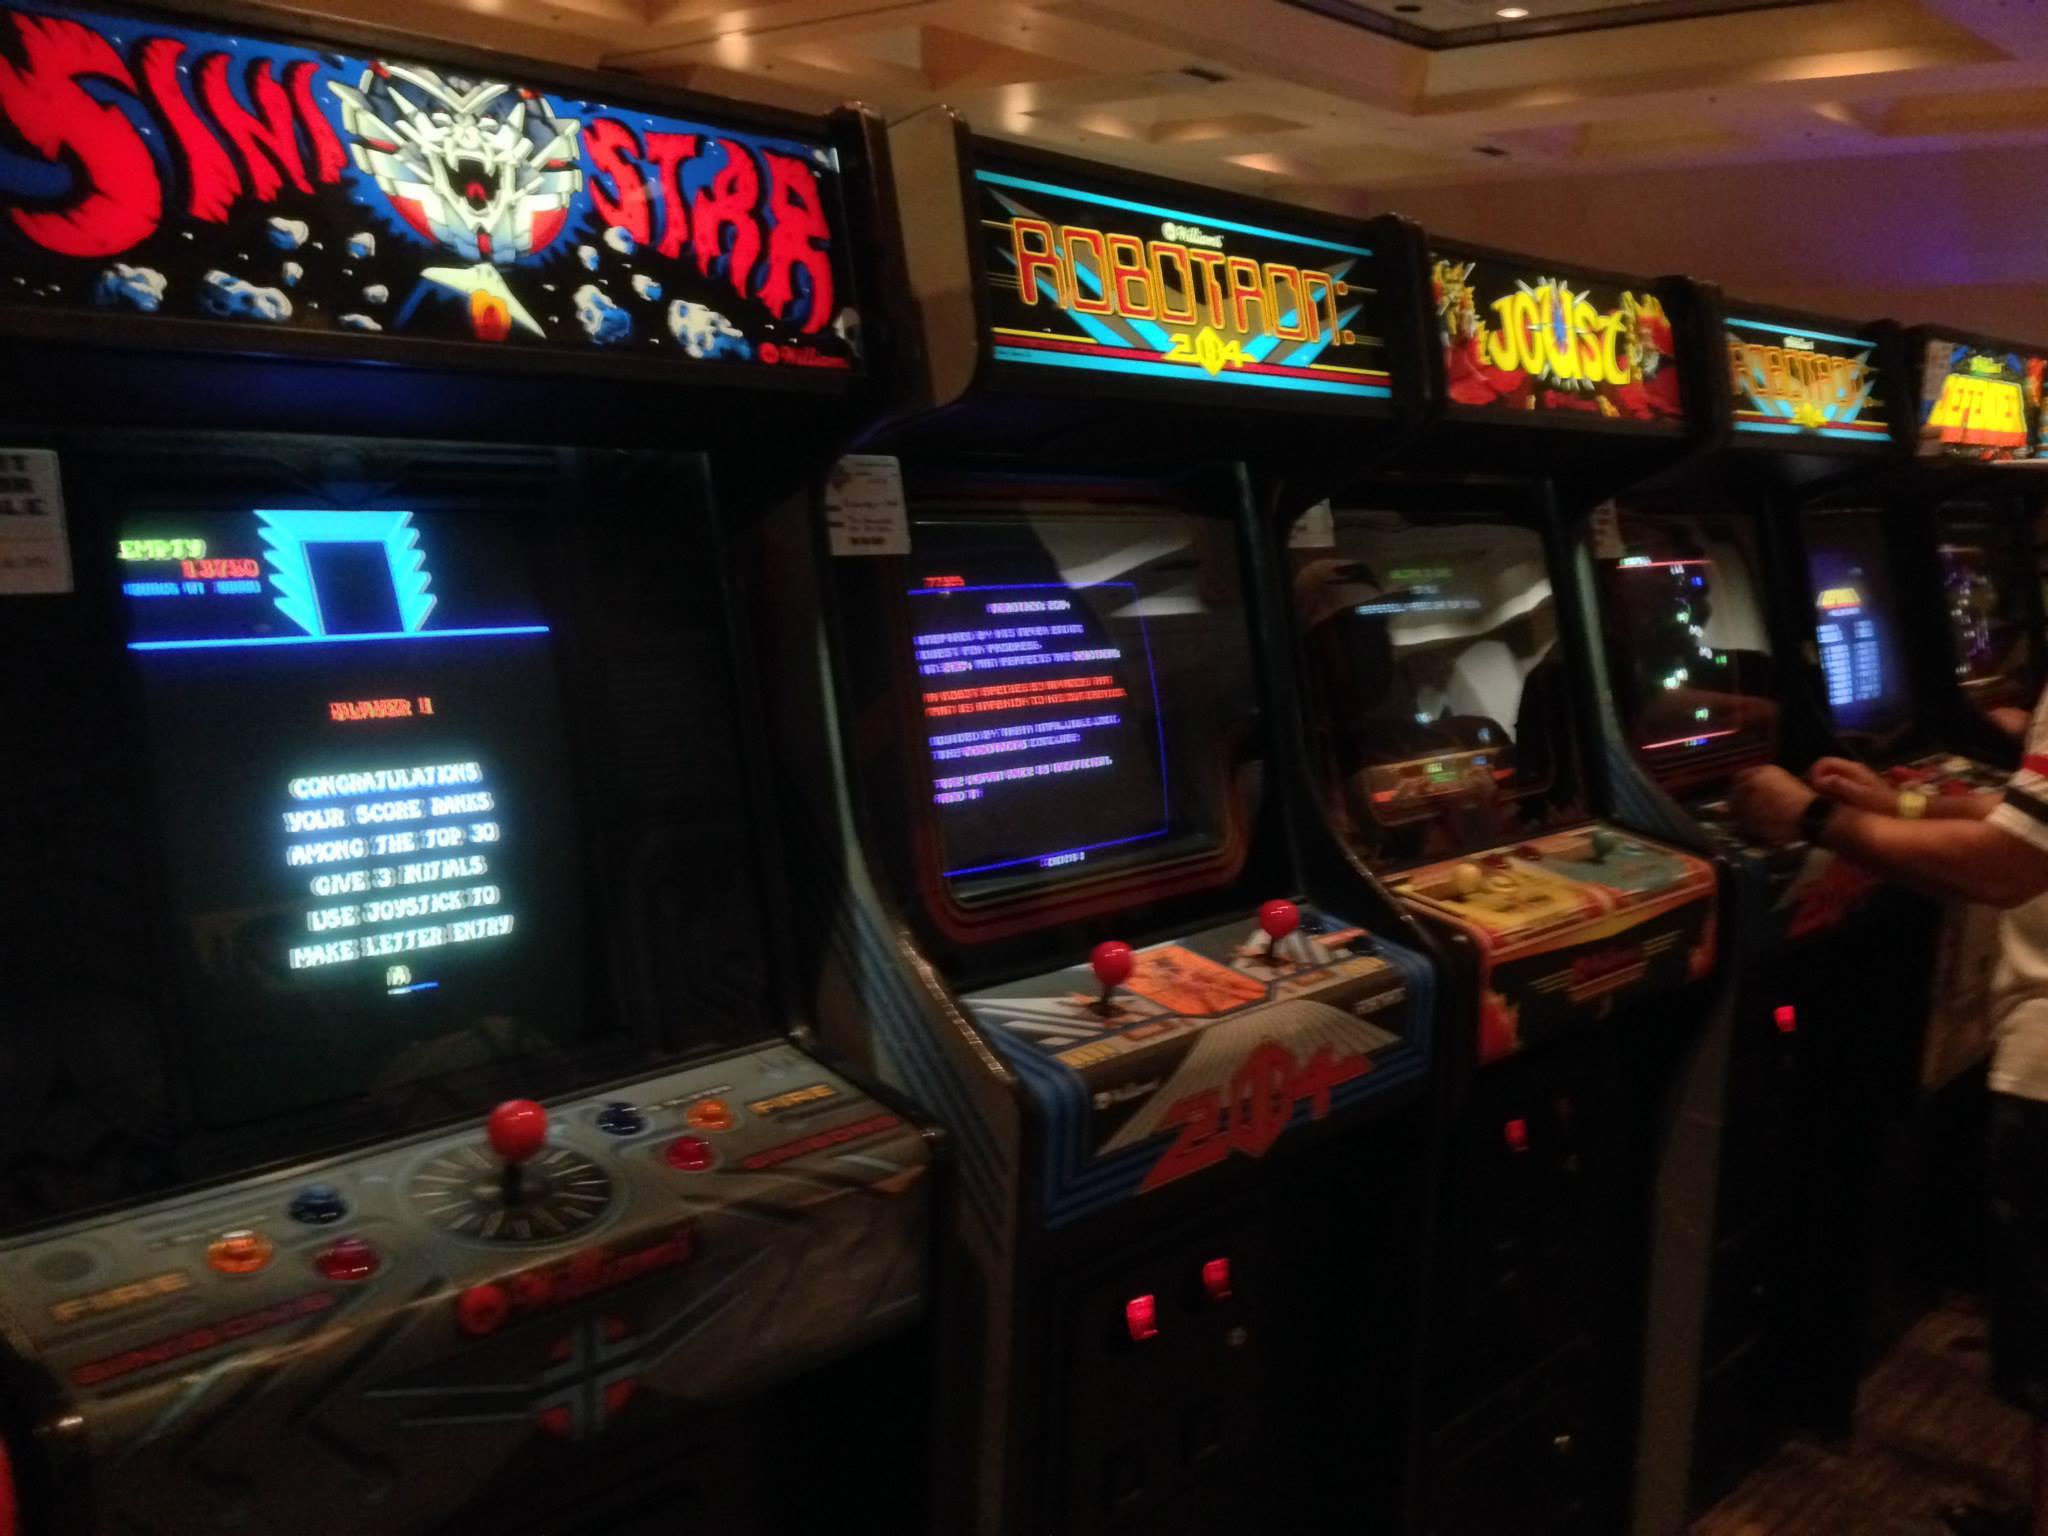 The last arcade in Boston screenshot